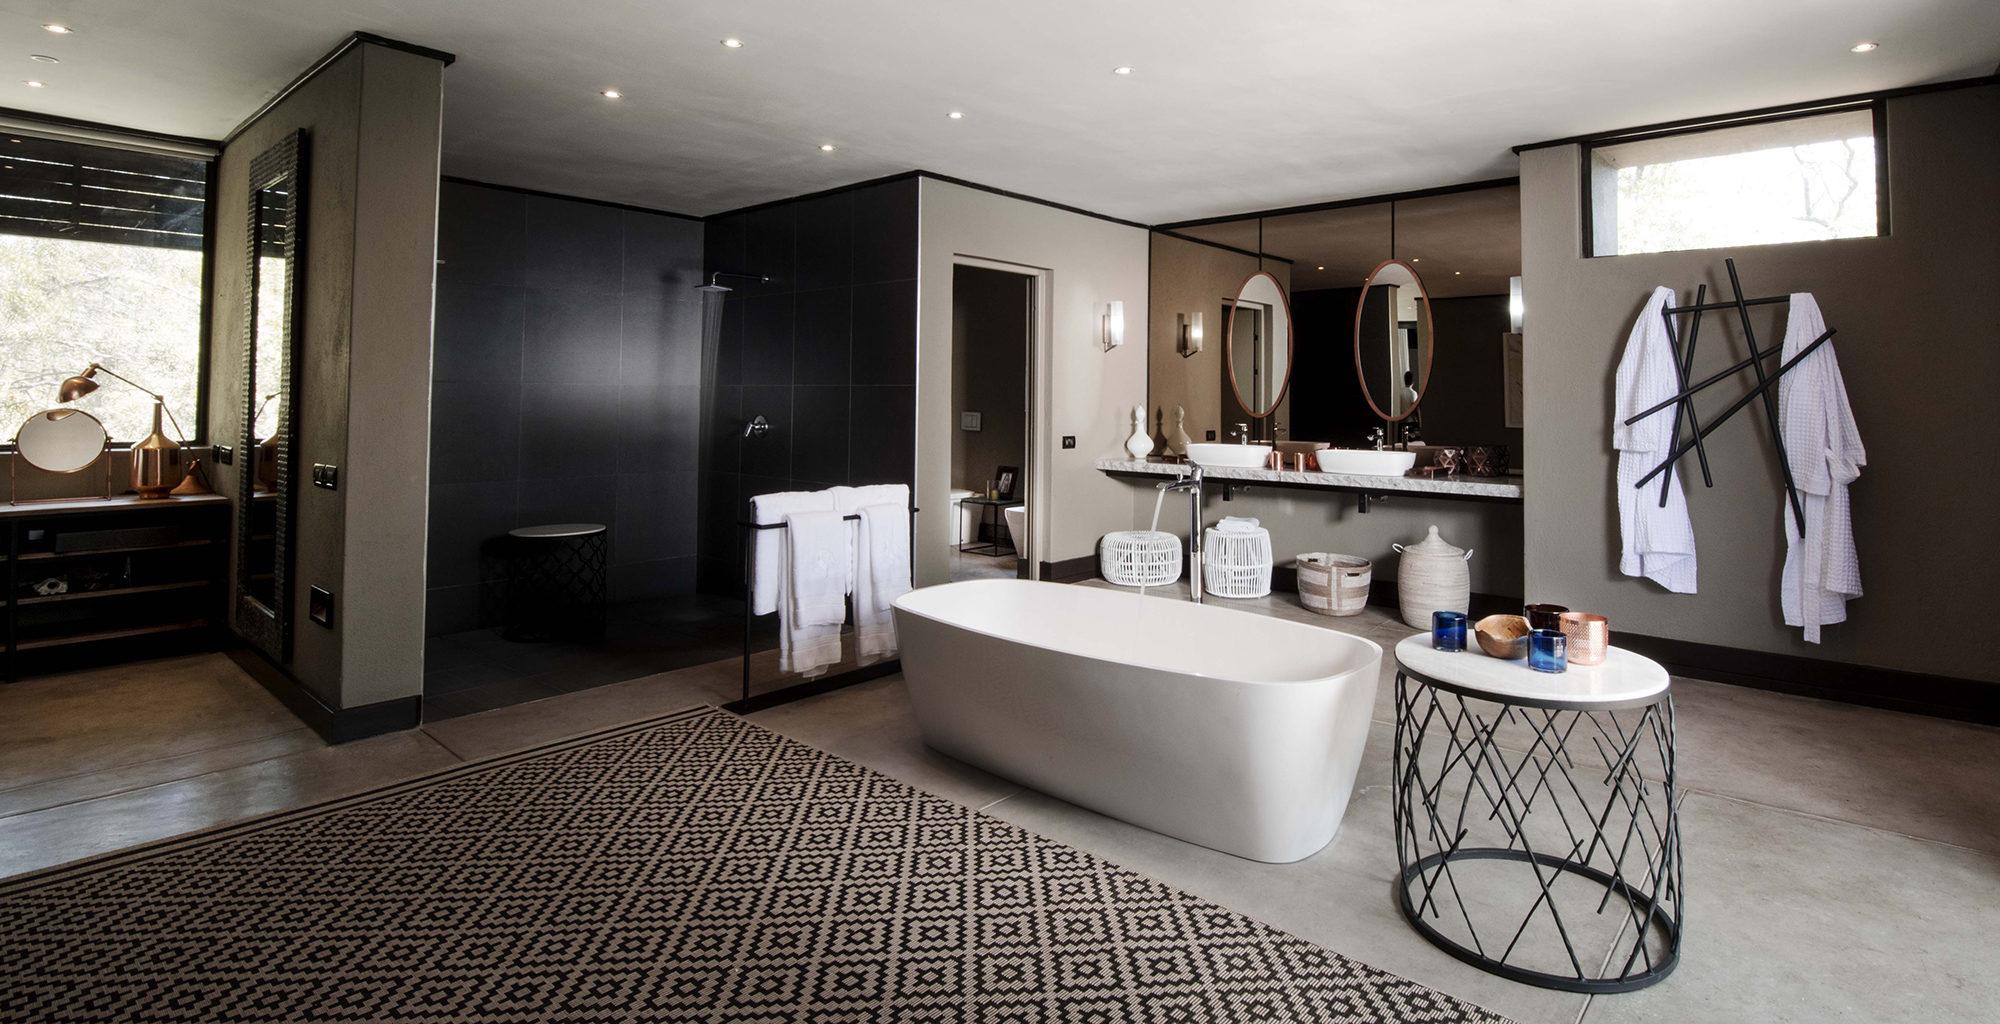 South-Africa-Silvan-Safari-Bathroom